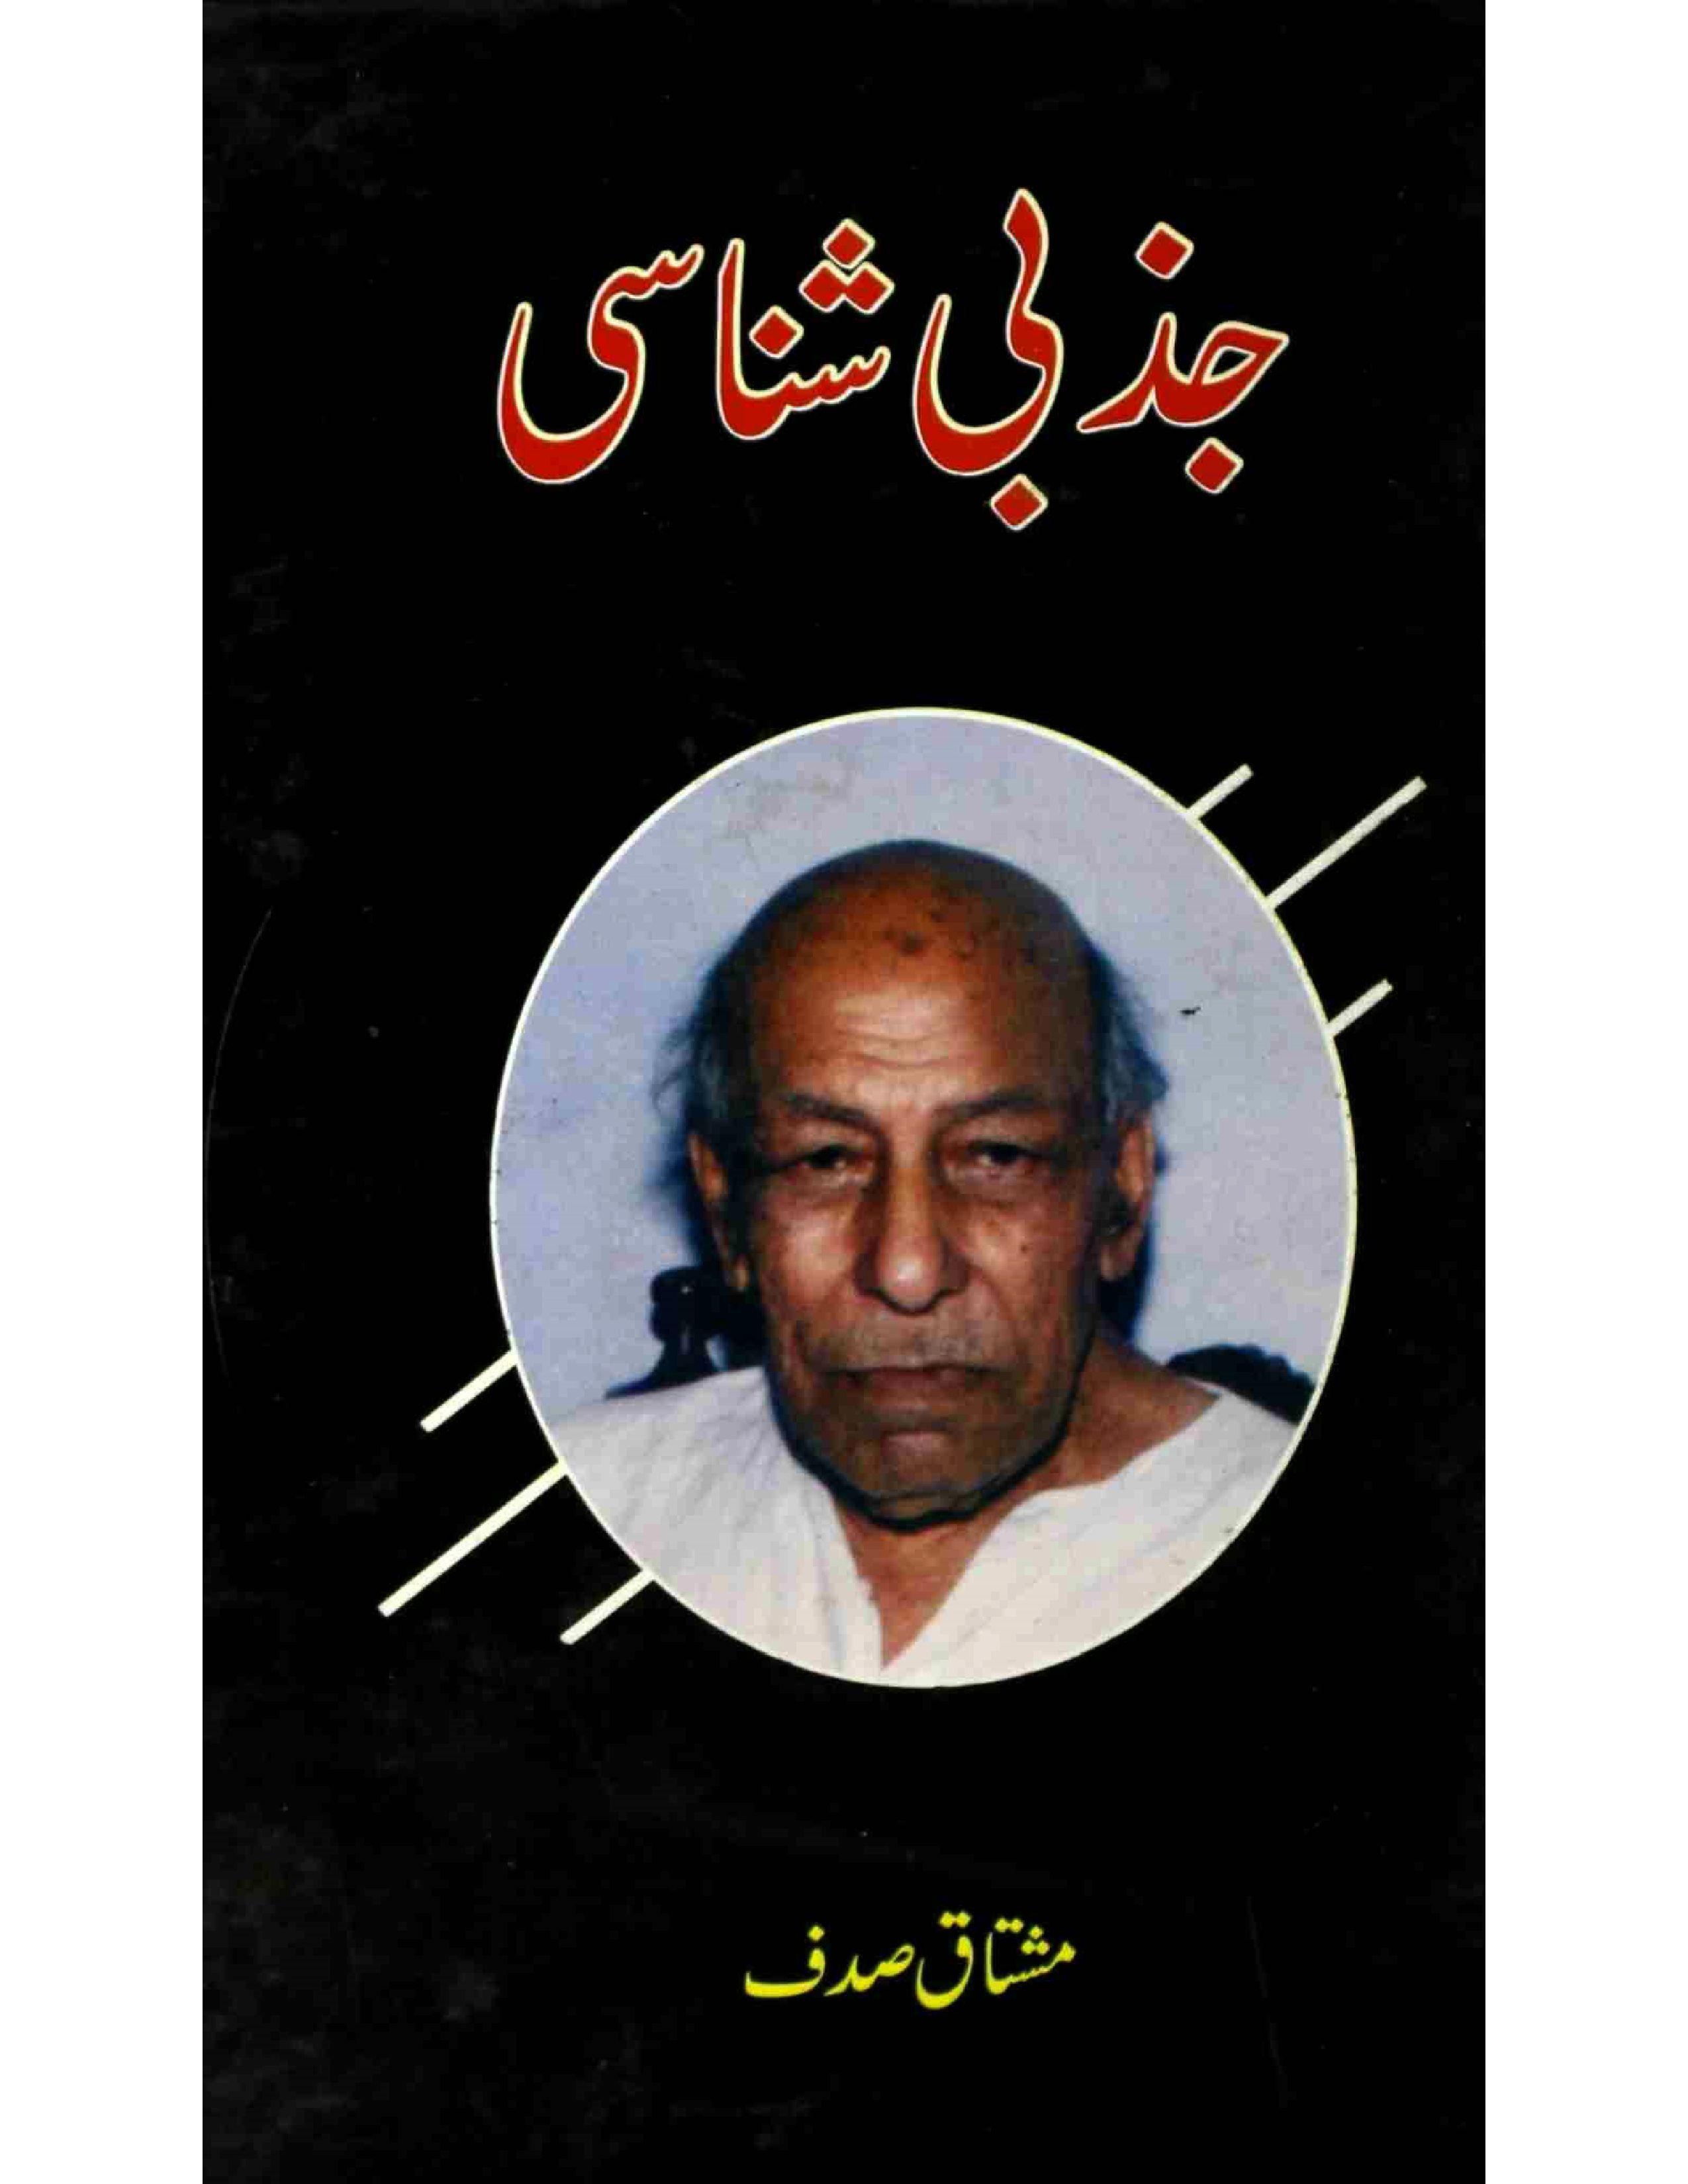 Jazbi Shanasi